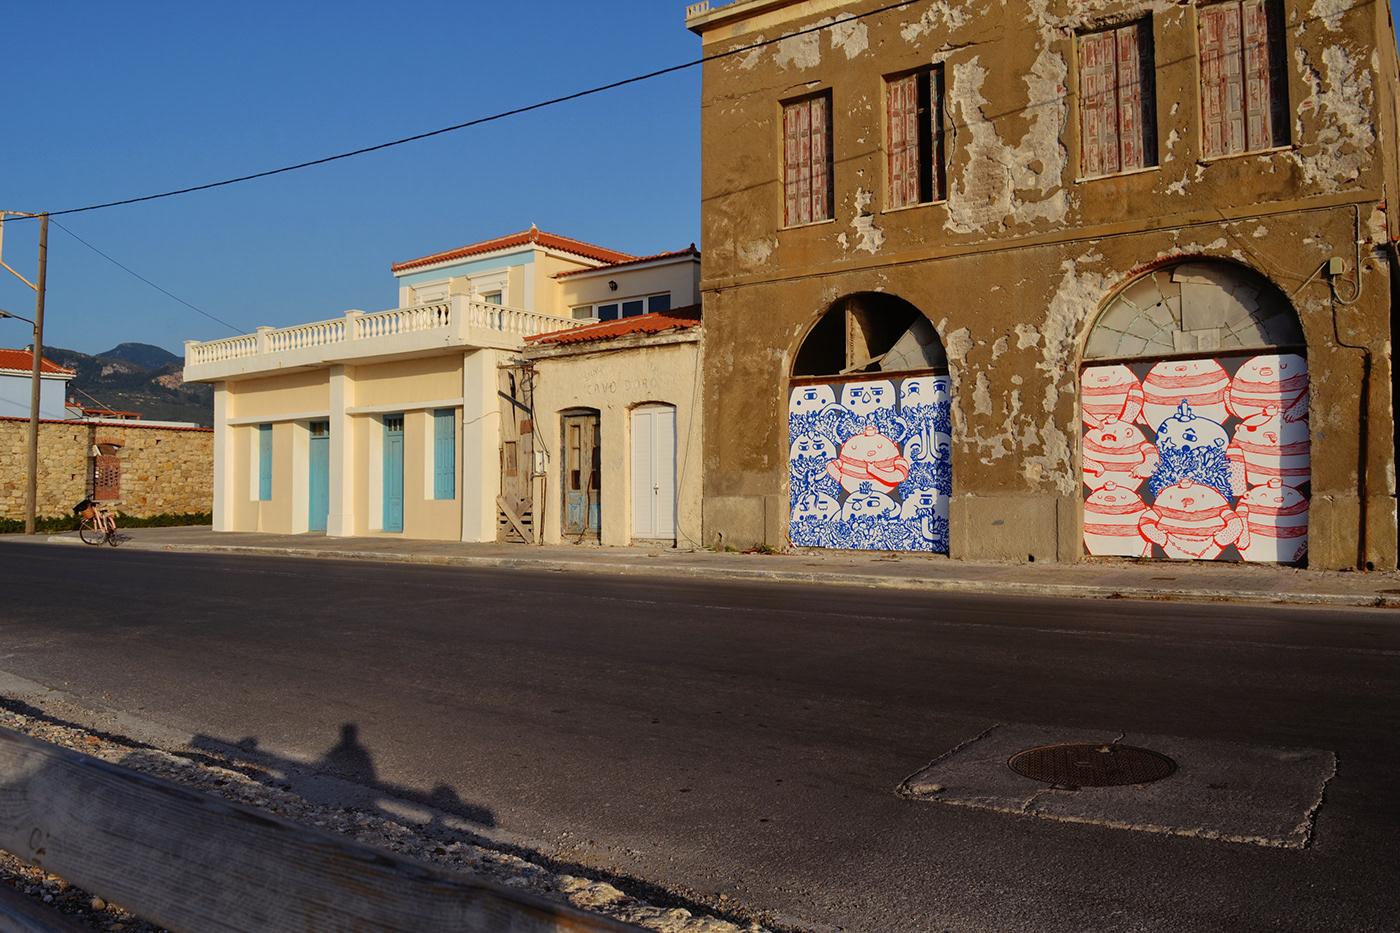 barba dee Dreyk the Pirate duality Karlovasi Mural samos Street Art